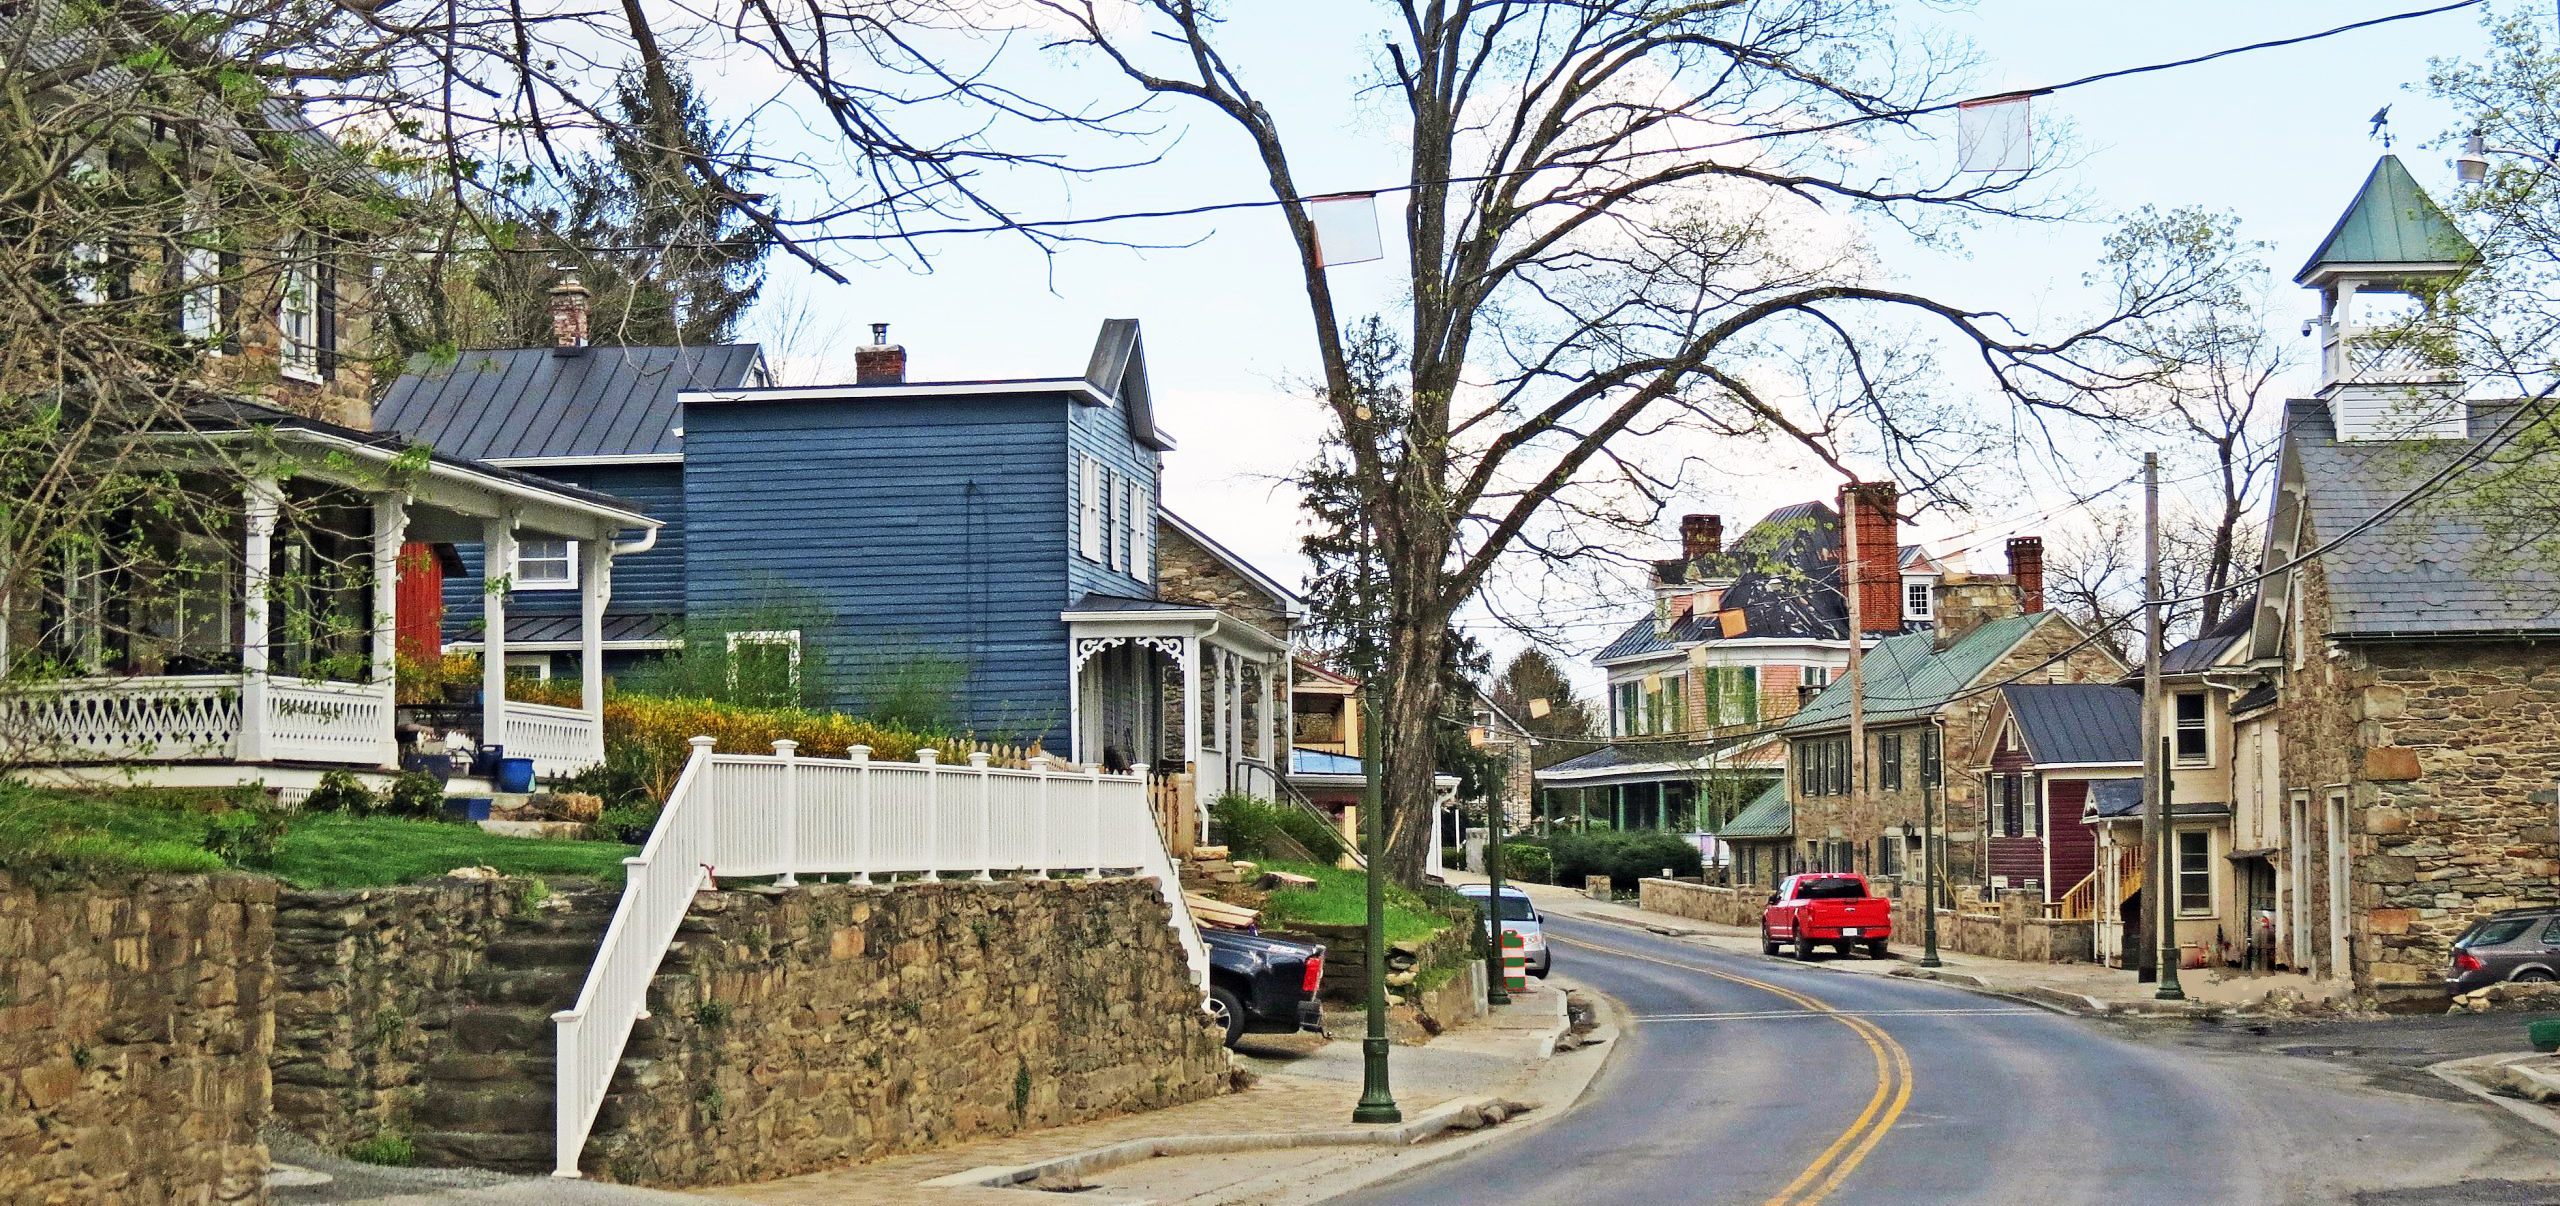 Hillsboro Historic District